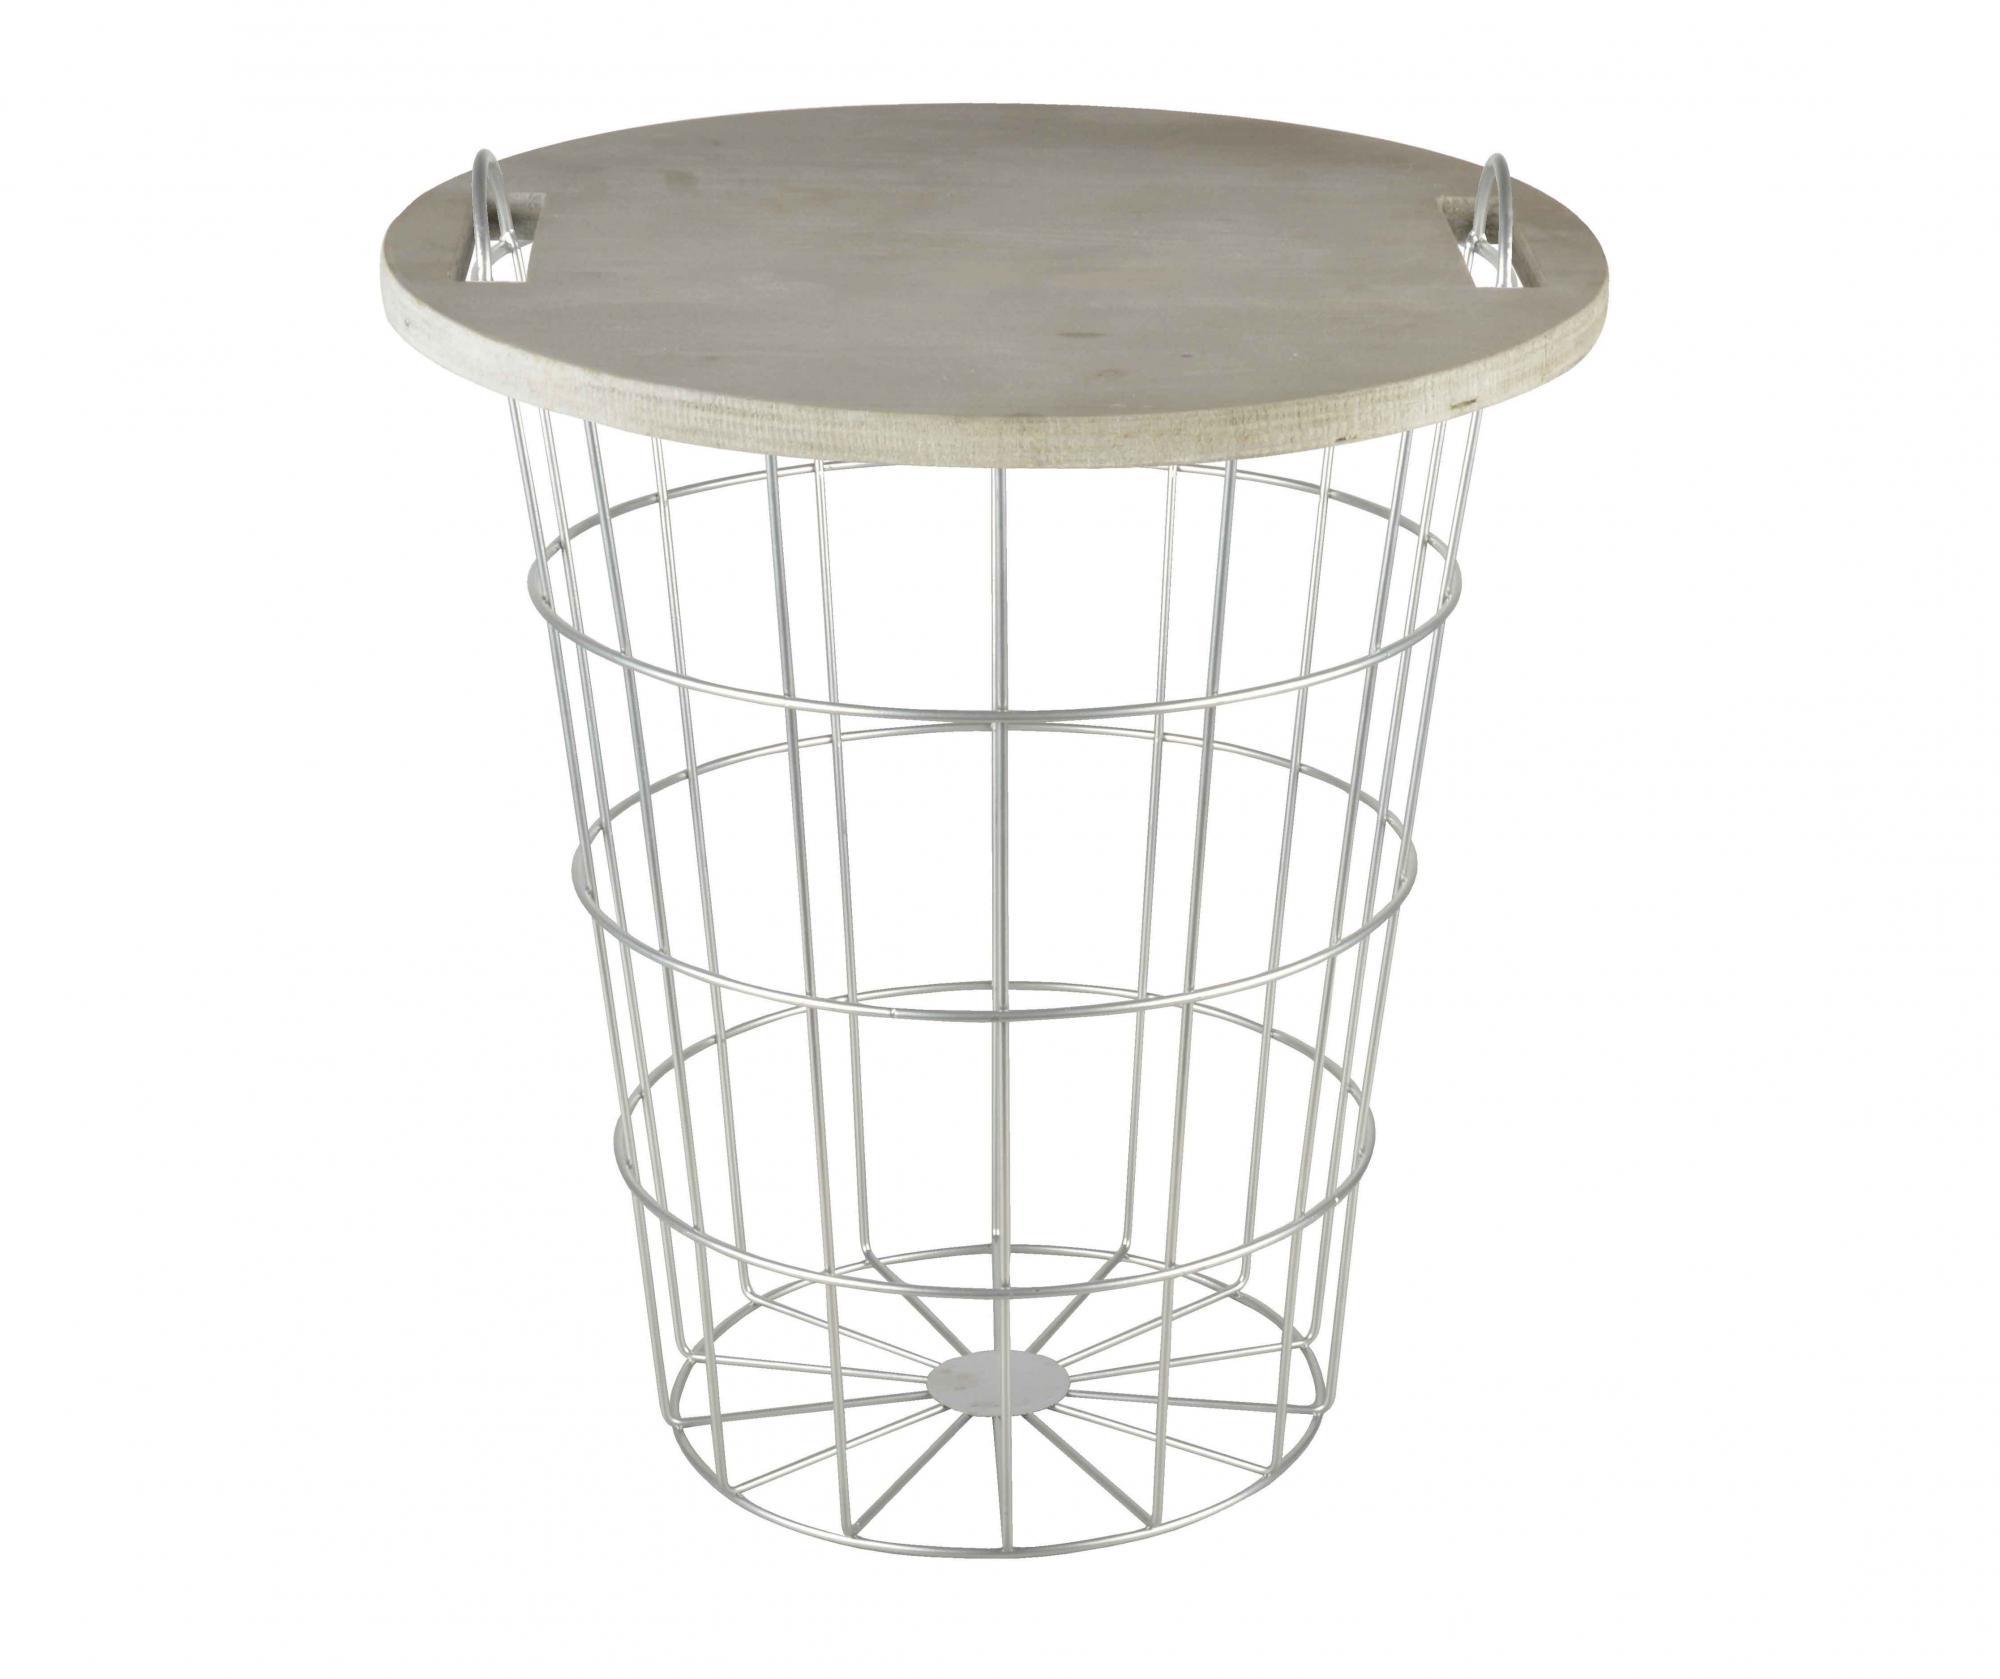 Masuta de cafea Marima - Esschert Design, Gri & Argintiu